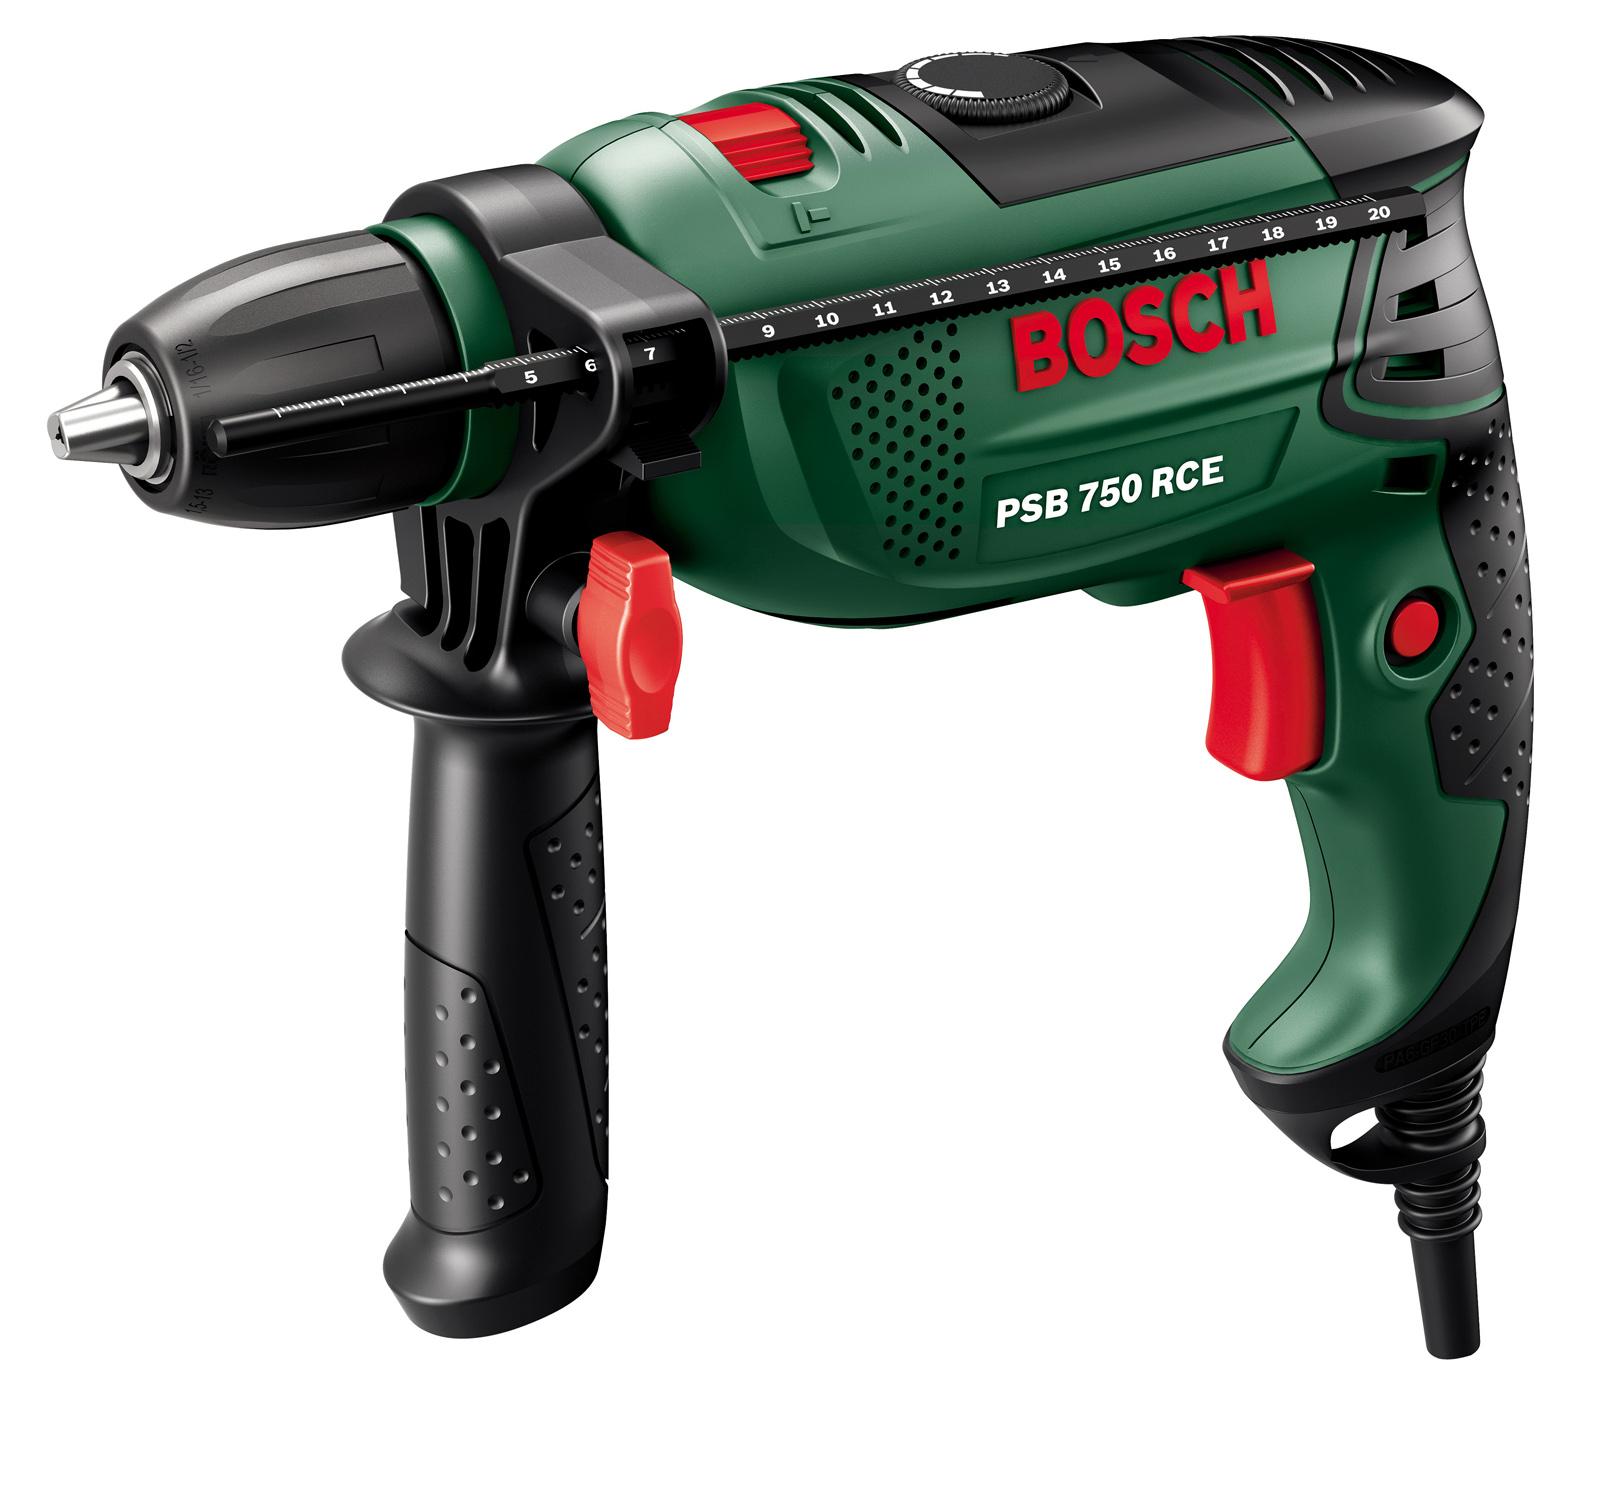 Дрель ударная Bosch Psb 750 rce (compact)